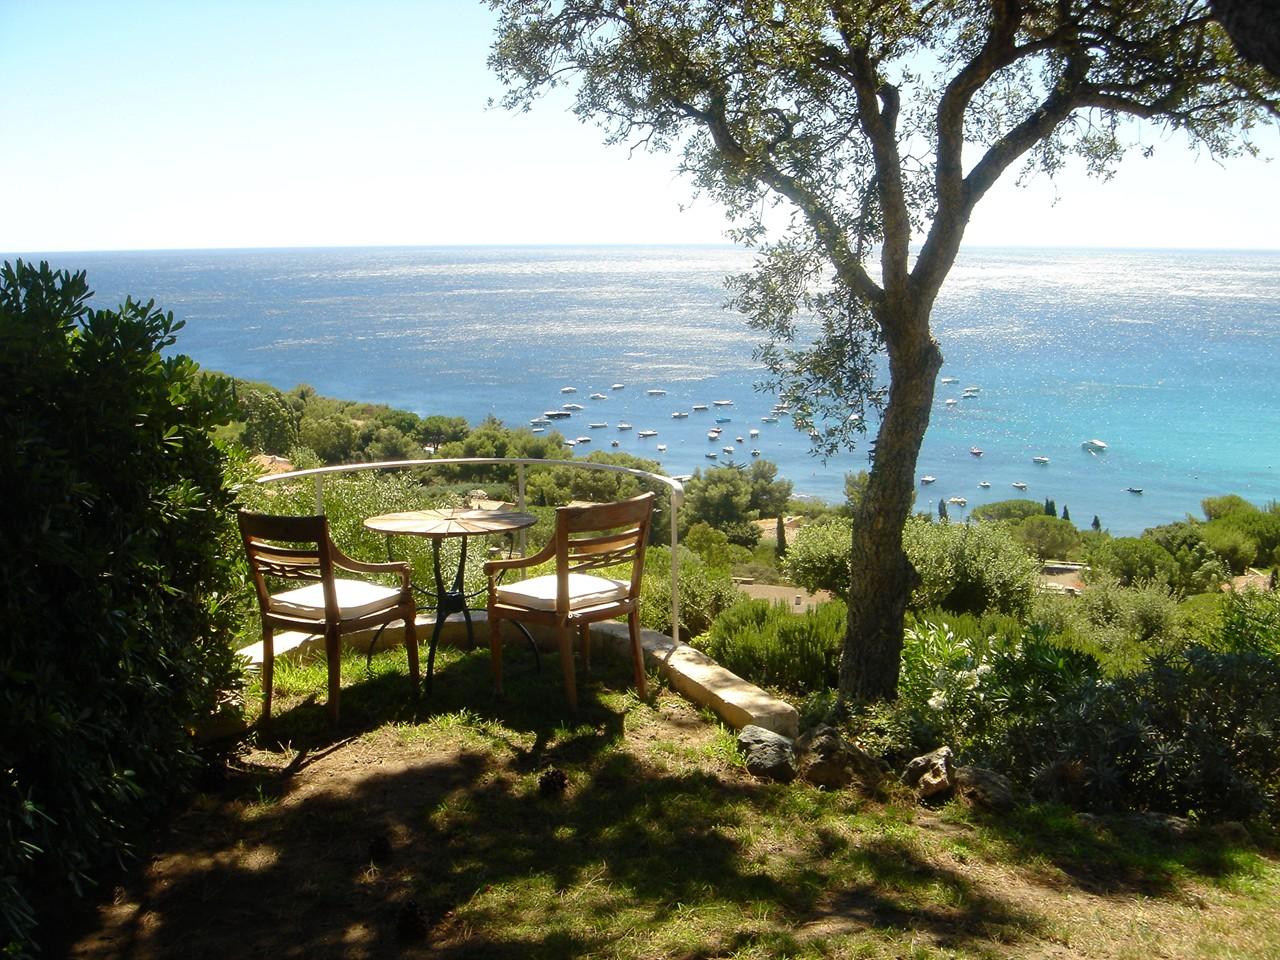 WIMCO Villas, Just Fabulous, ACV FAB, France, St. Tropez & The Var, Family Friendly Villa, 4 Bedroom Villa, 4 Bathroom Villa, Pool, View from Villa, WiFi